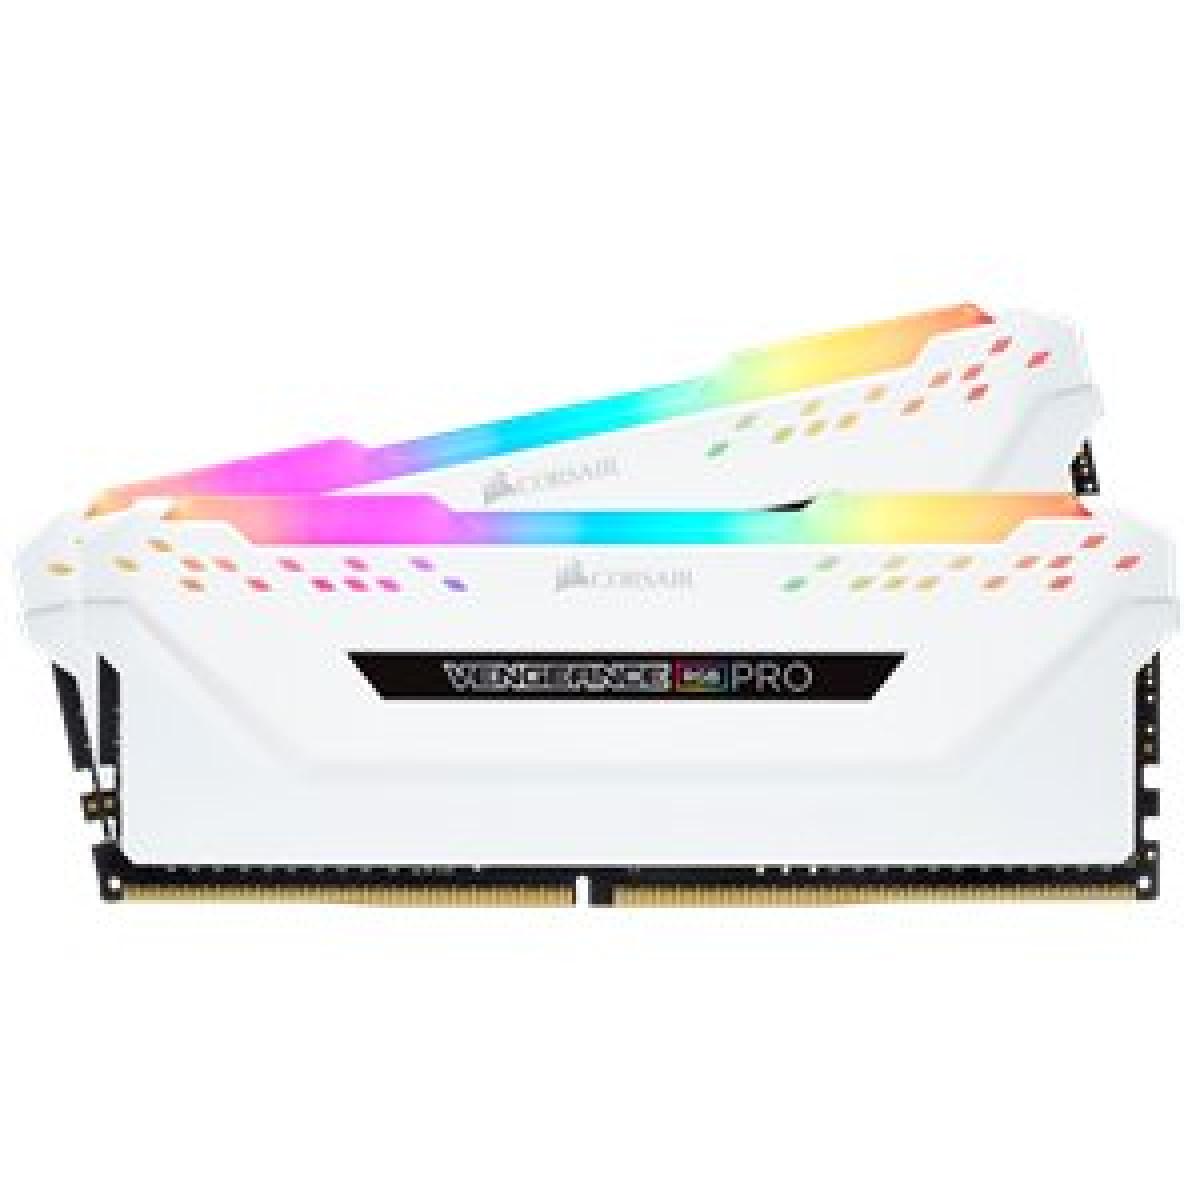 CORSAIR CMW16GX4M2C3600C18W DDR4, 3600MHZ 16GB 2X8